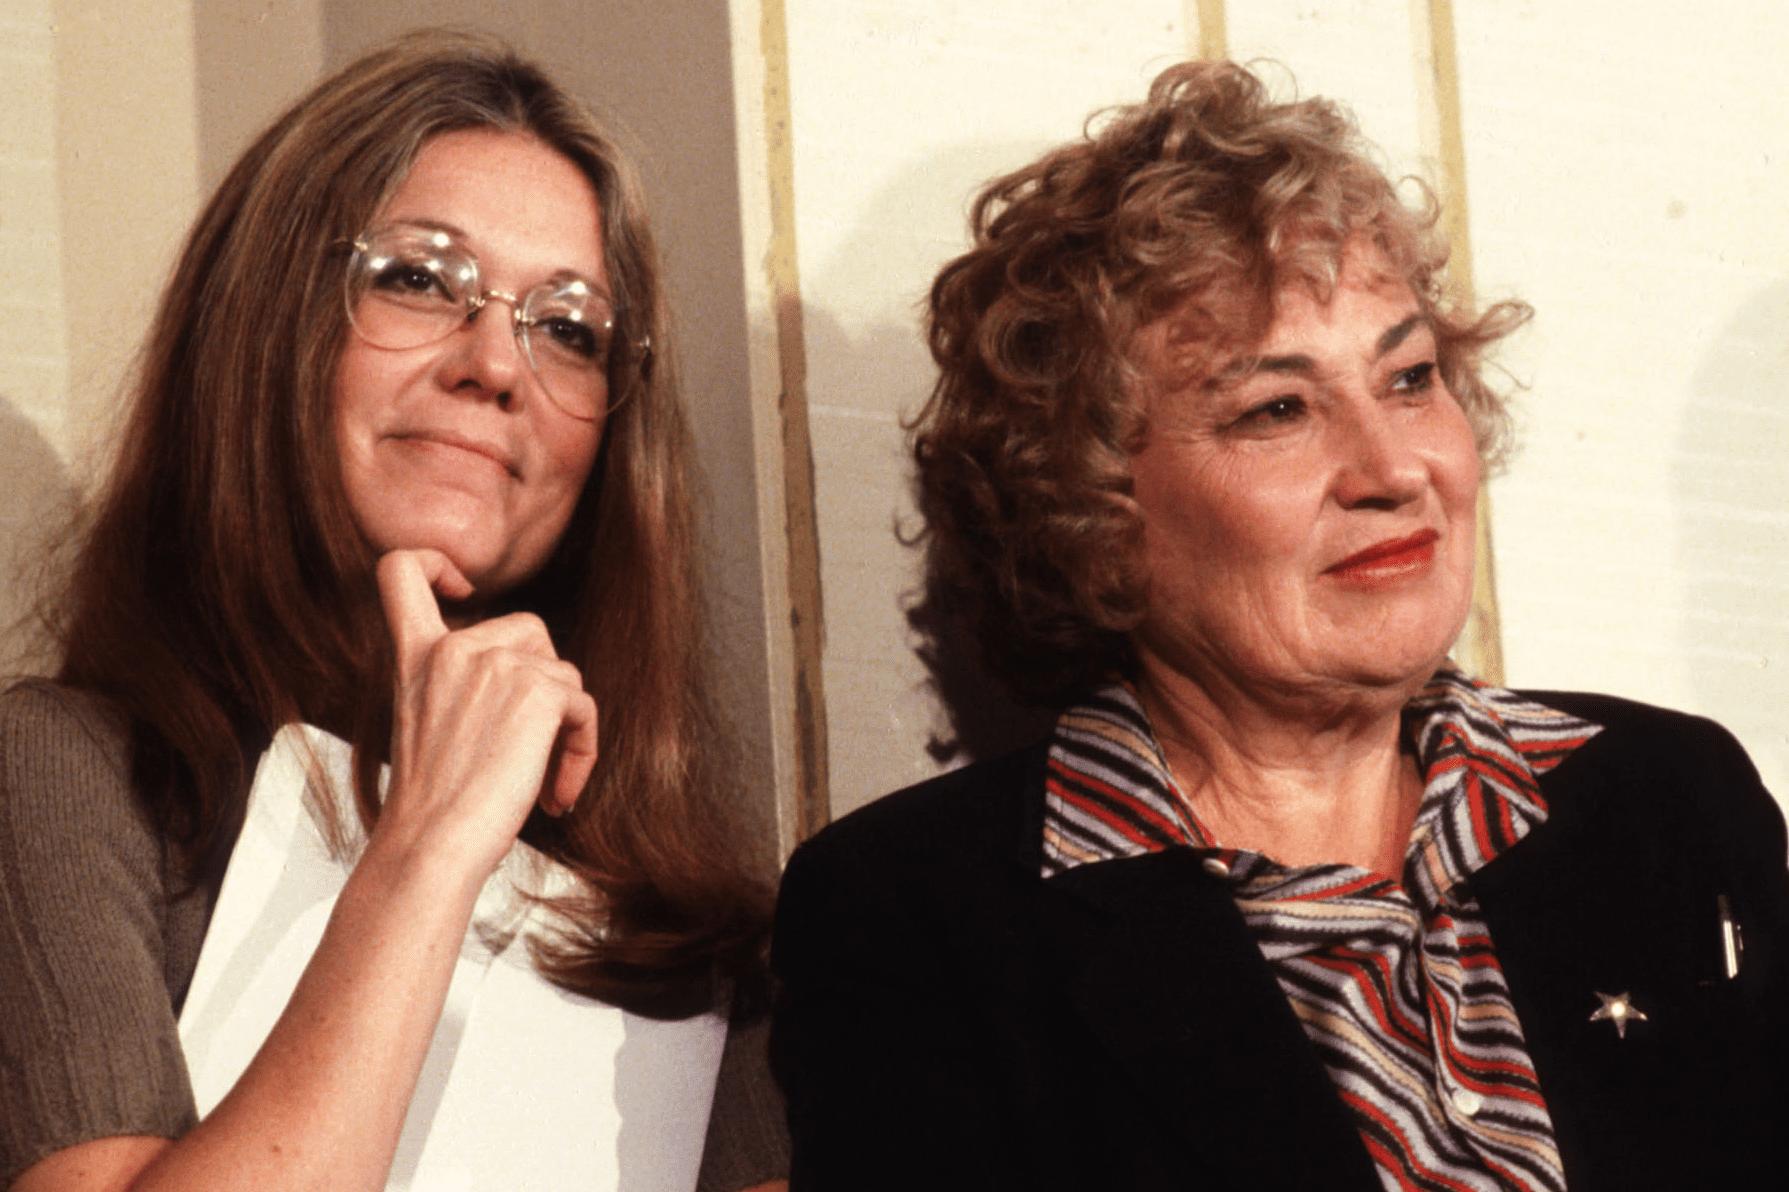 Gloria Steinem and Bella Abzug, 1980